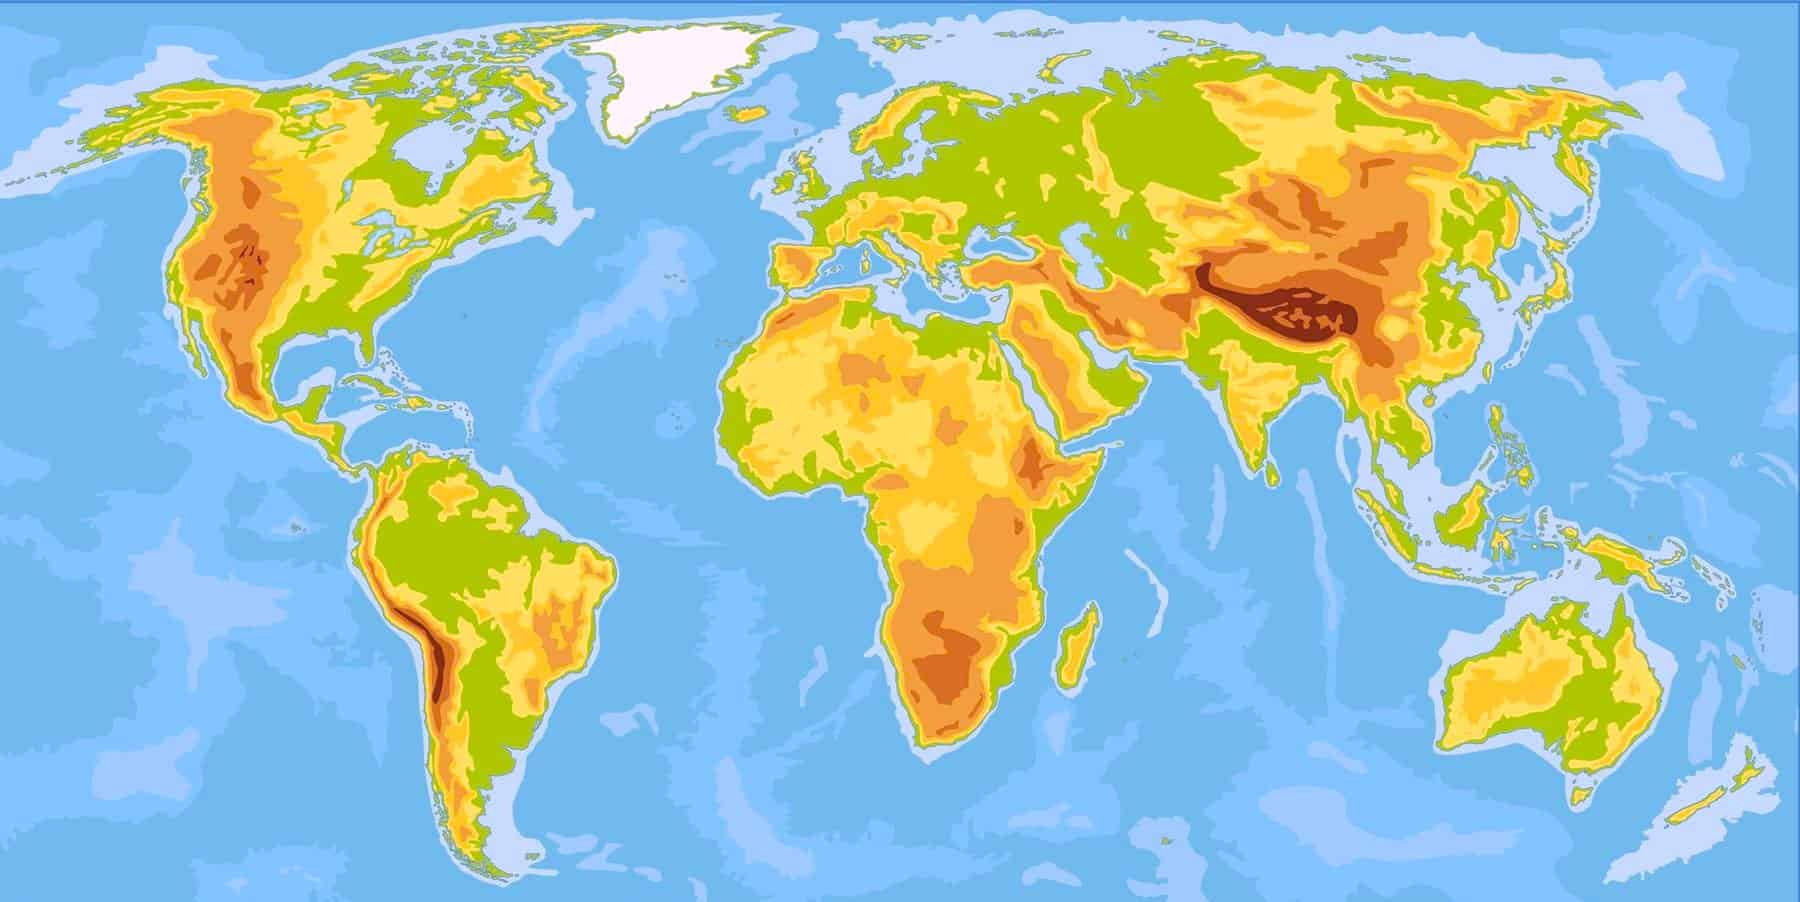 Mapa Del Mundo Paises Para Imprimir.Mapamundi Mudo Para Imprimir Los Paises Del Mundo 2019